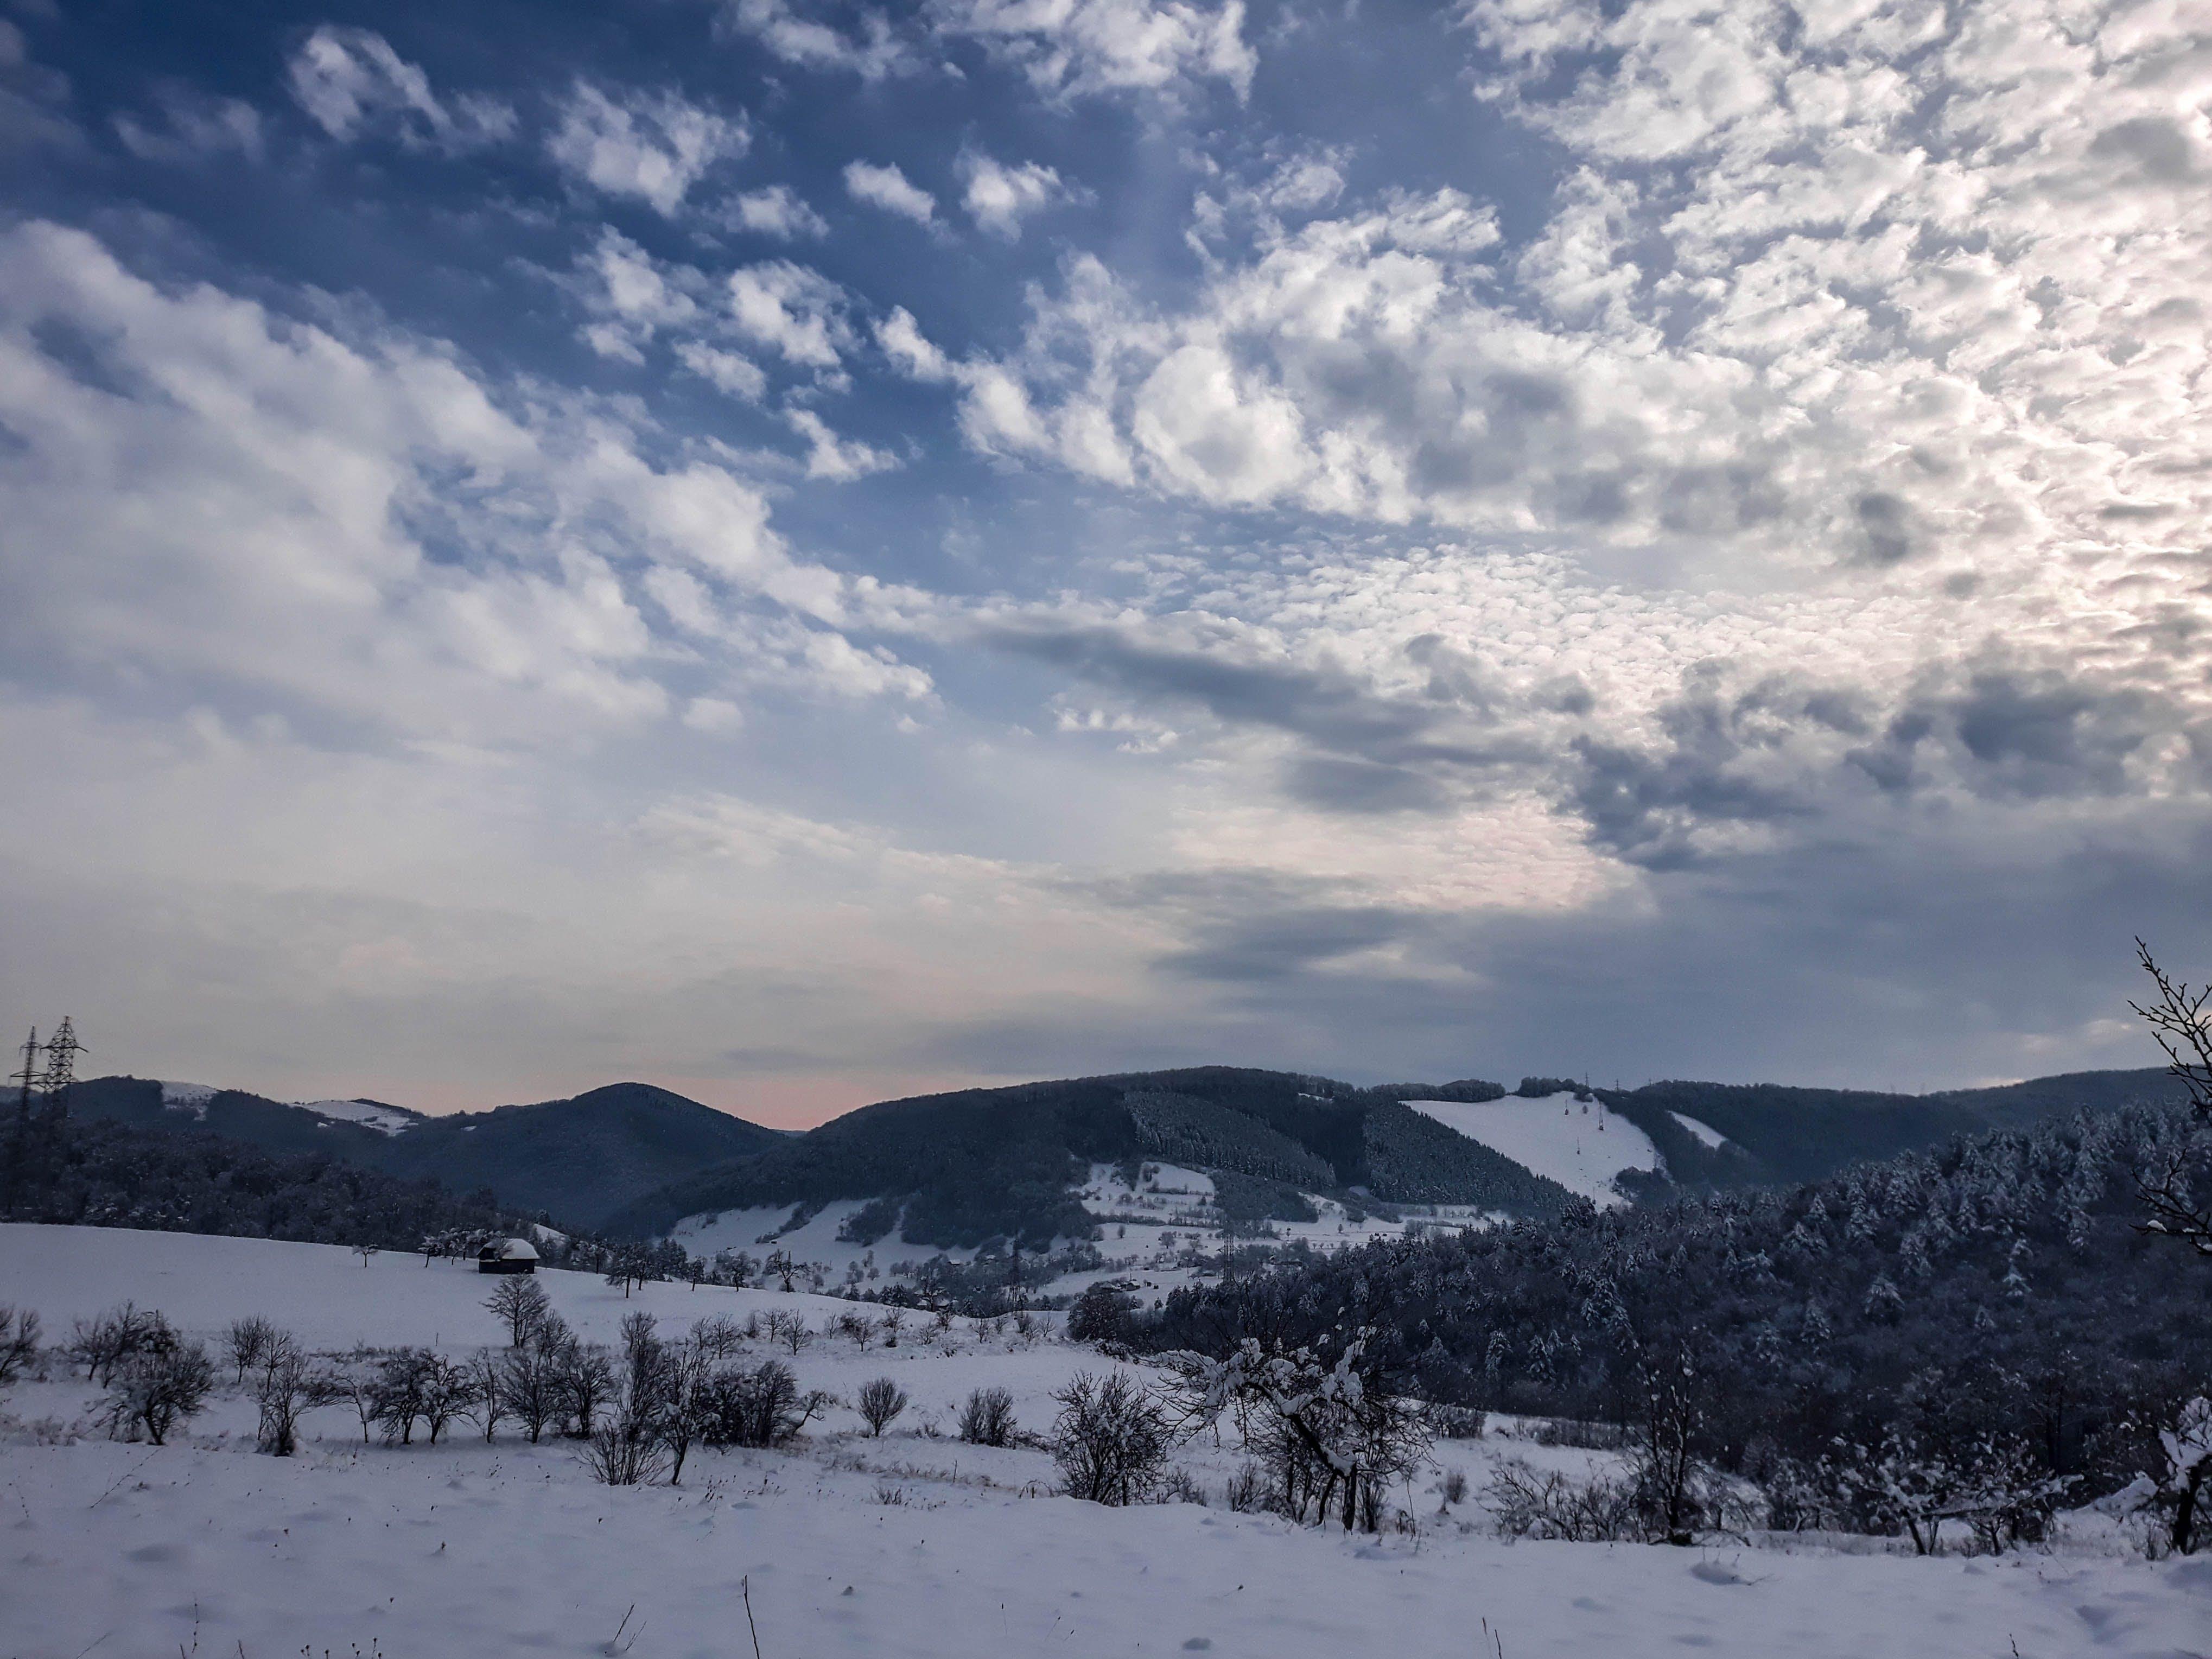 Free stock photo of landscape, snow, winter, winter landscape